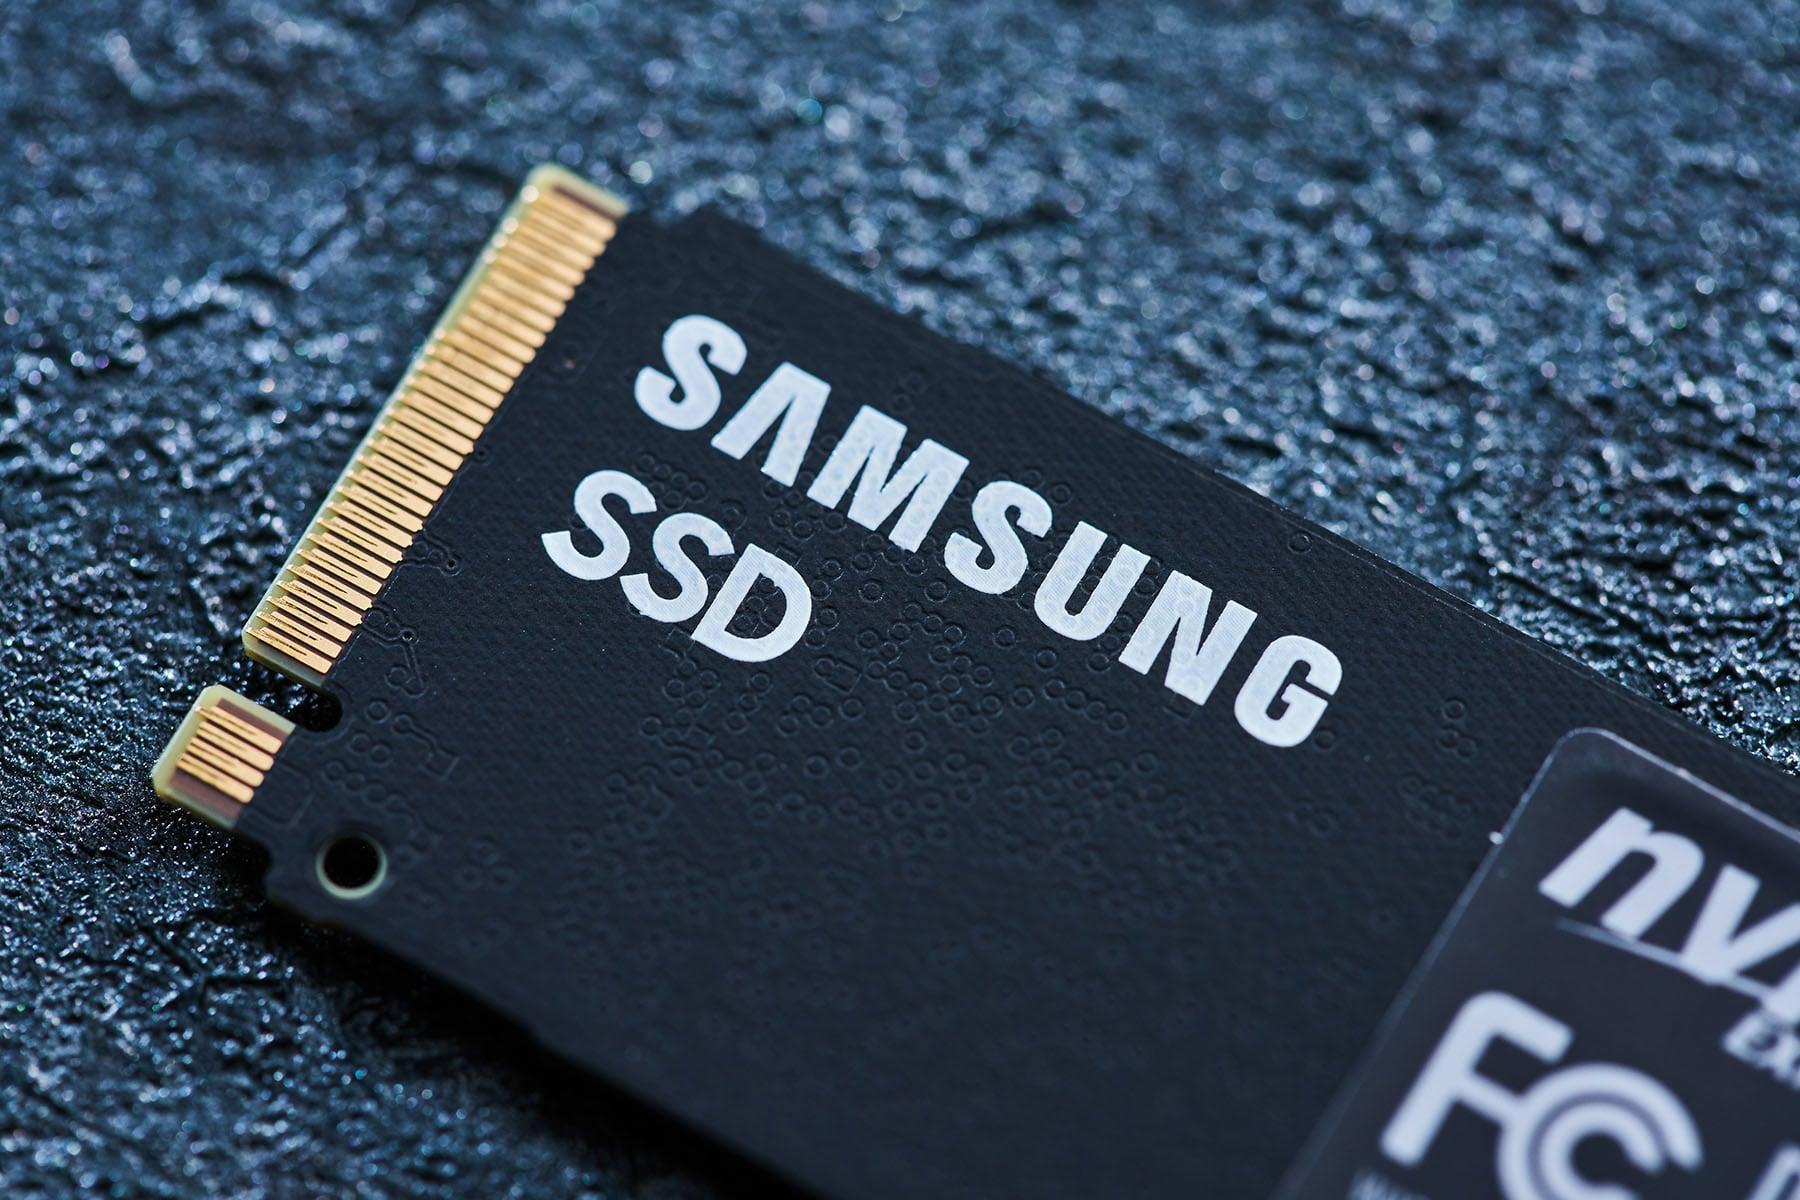 Samsung 980 PRO 的接口為 M key 形式。